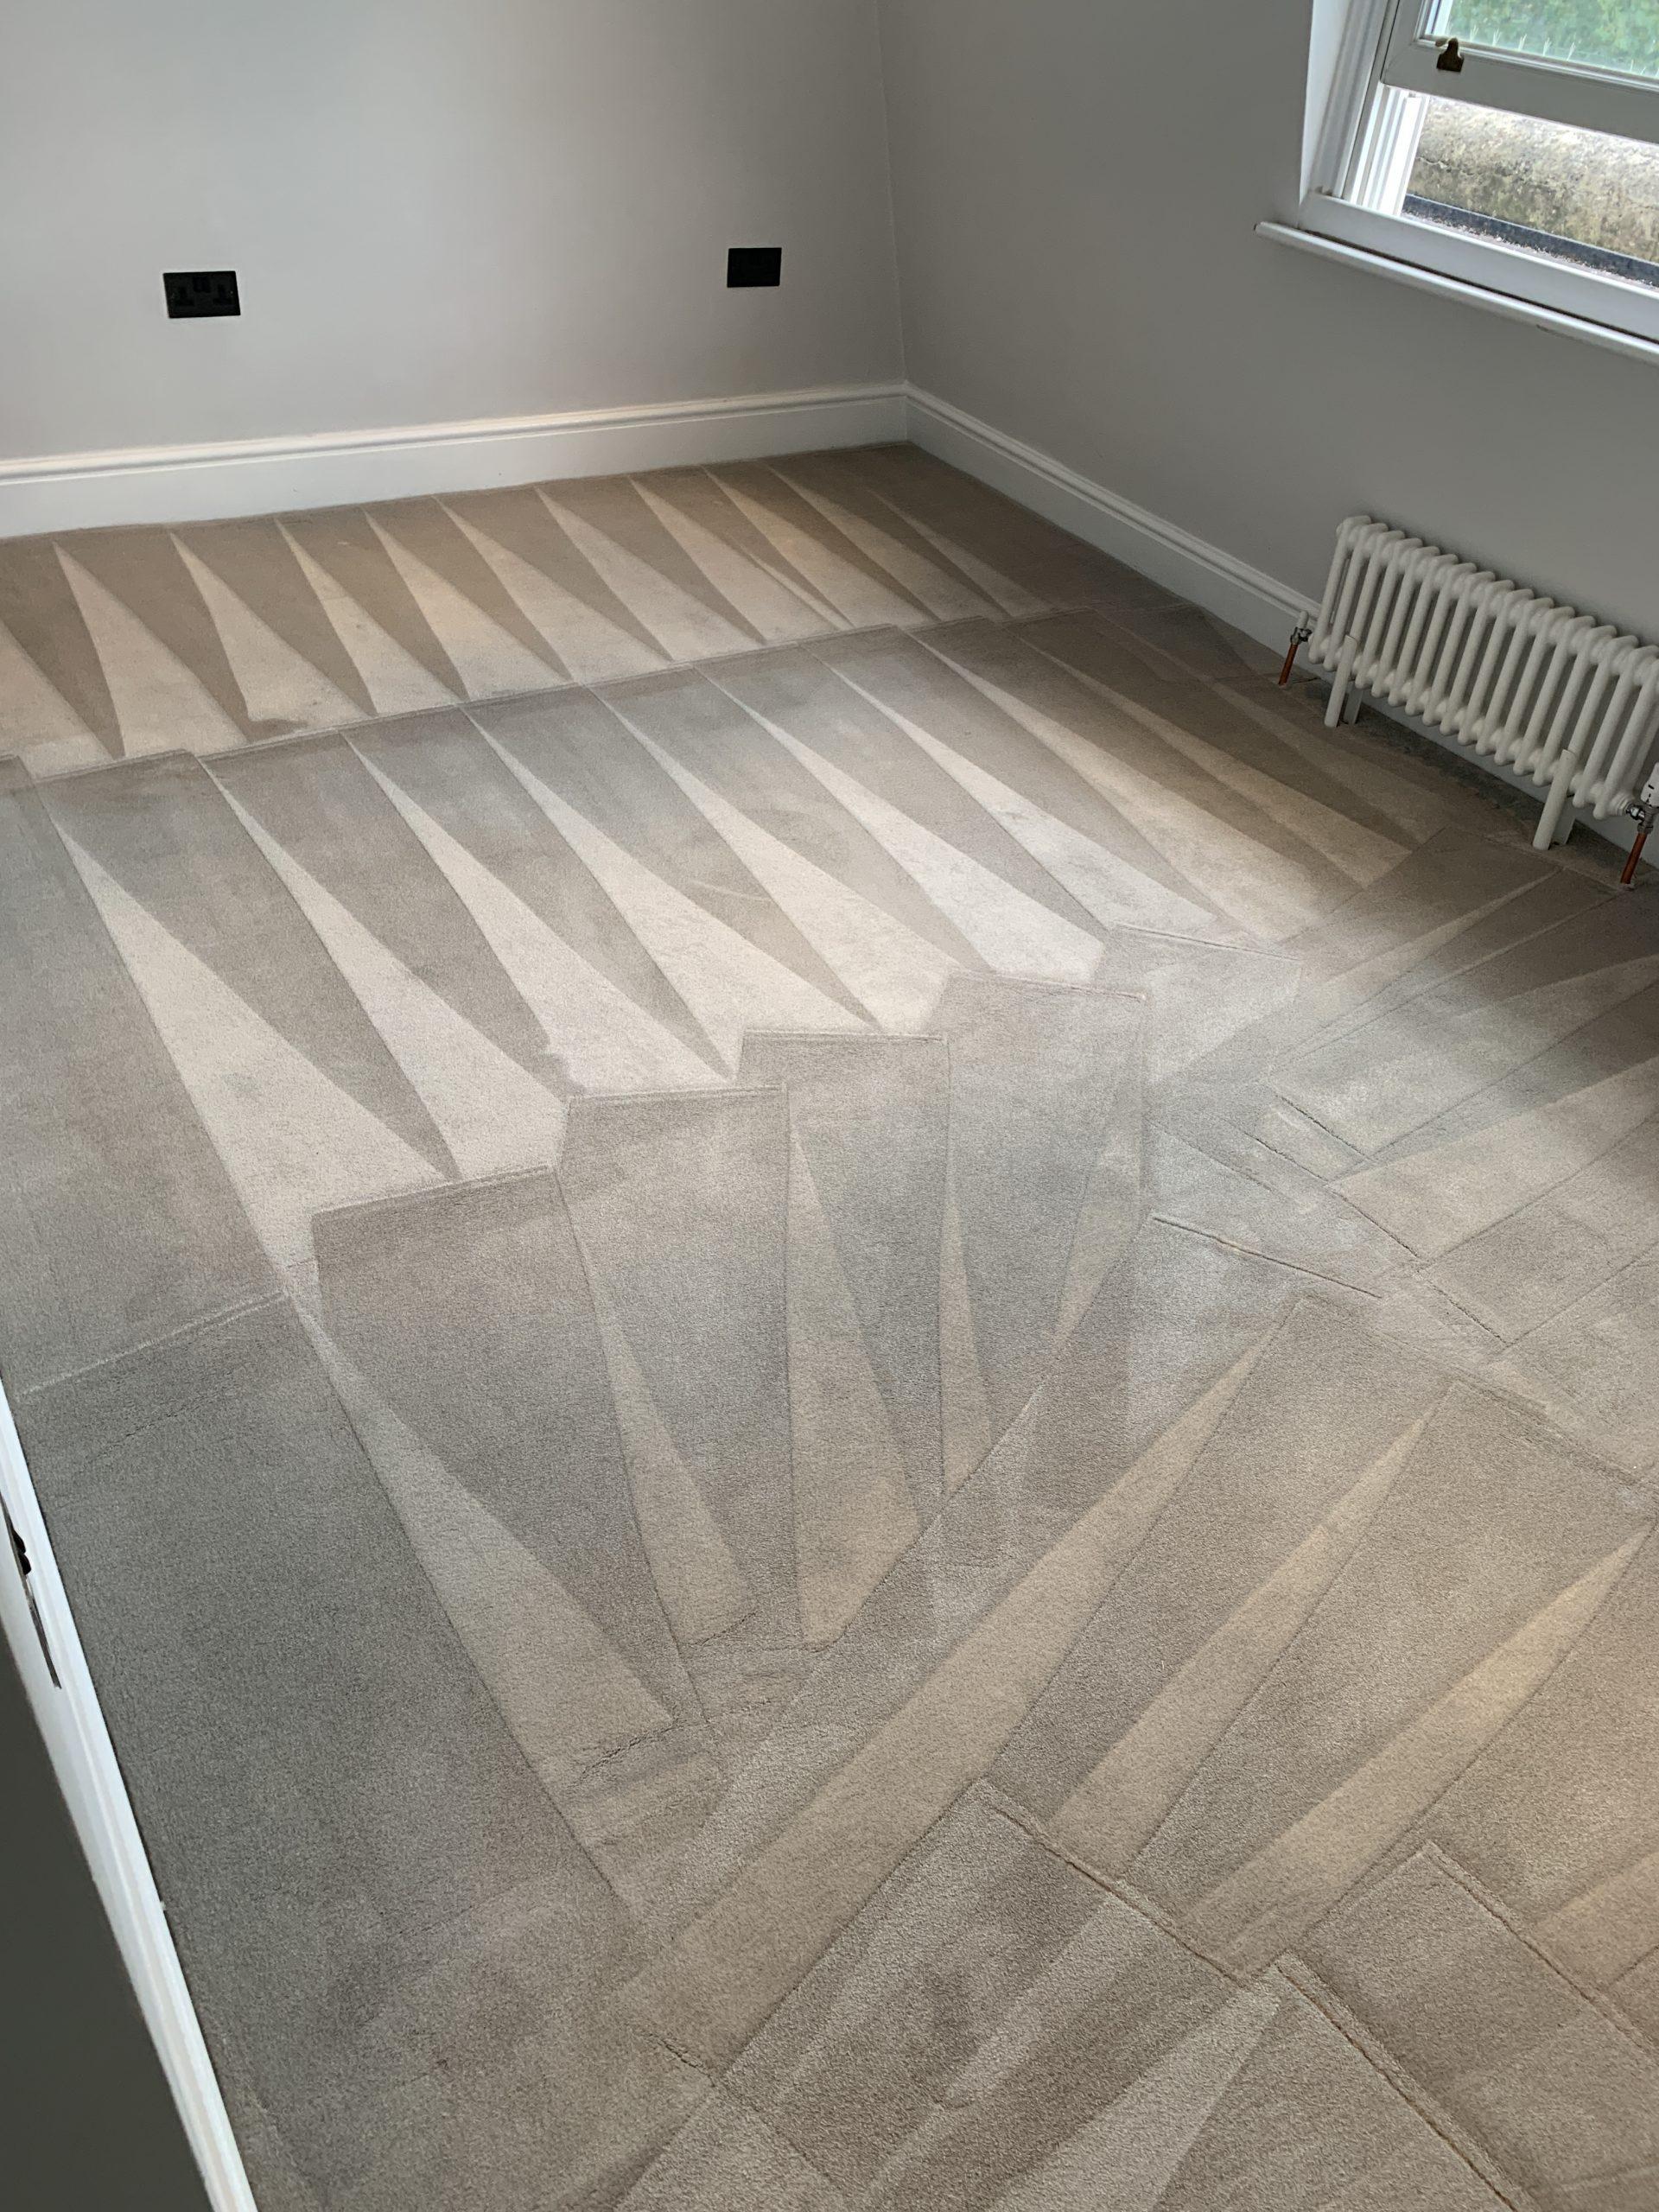 end of tenancy Carpet Cleaning London - Supreme Furnishings